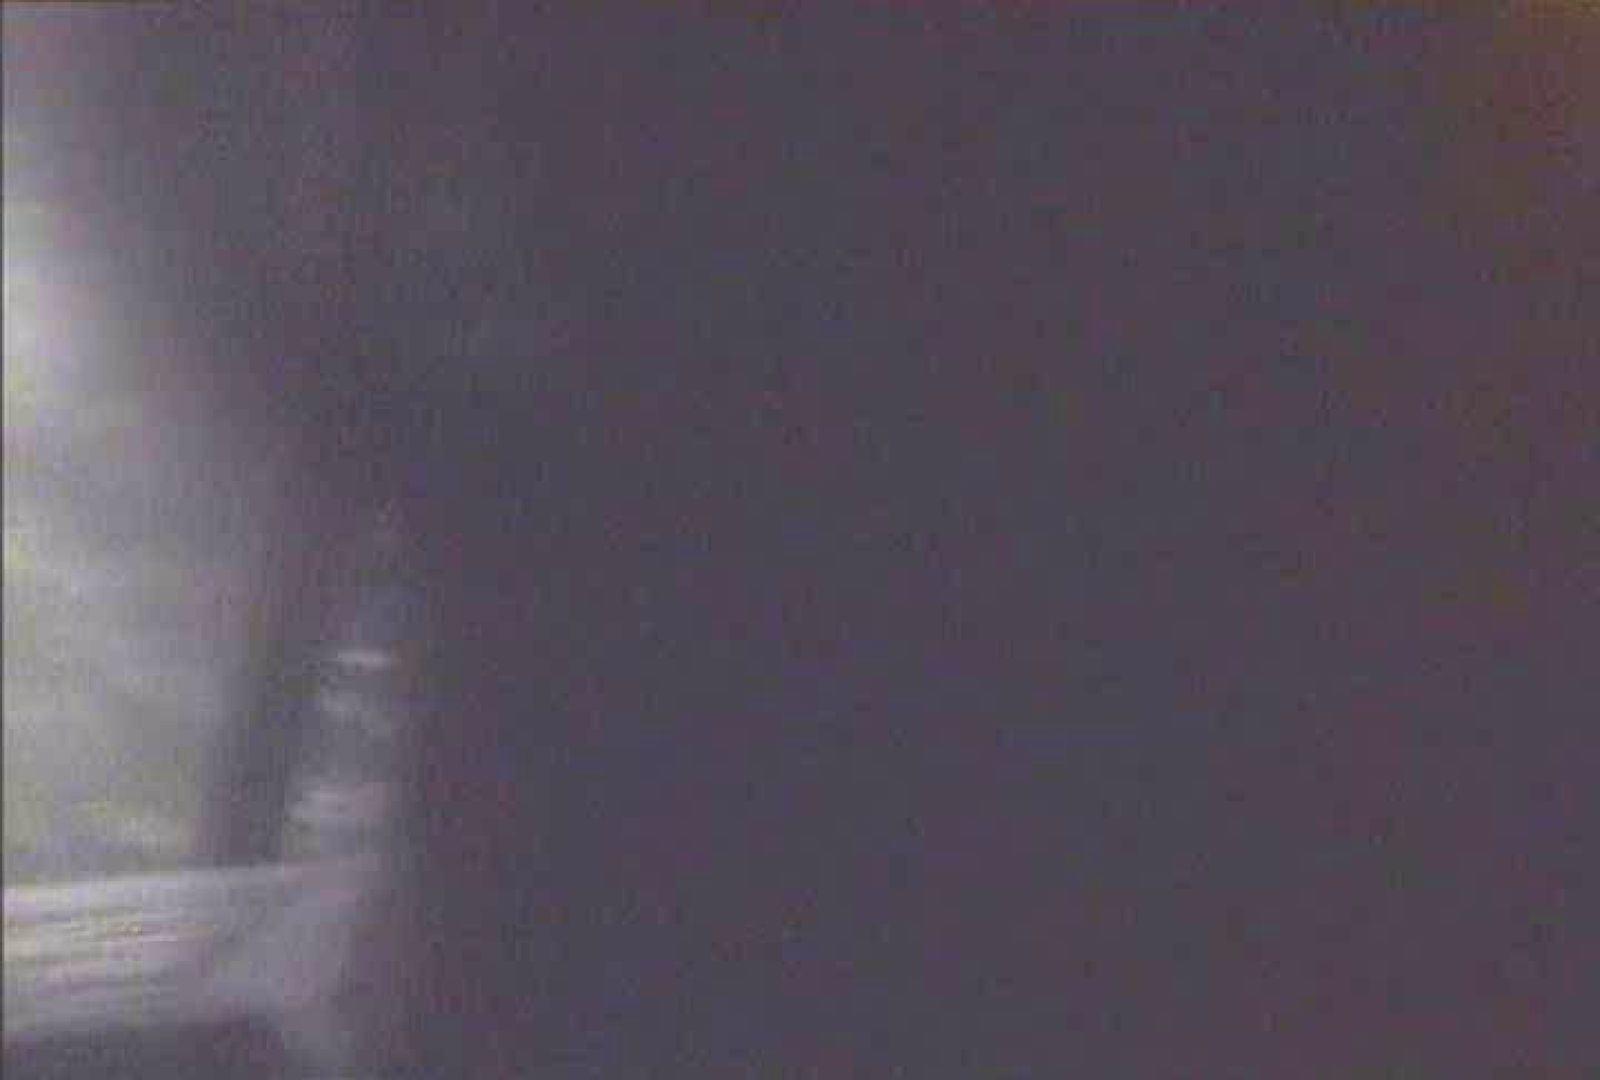 素人投稿シリーズ 盗撮 覗きの穴場 大浴場編  Vol.2 盗撮大放出 | 0  96連発 67